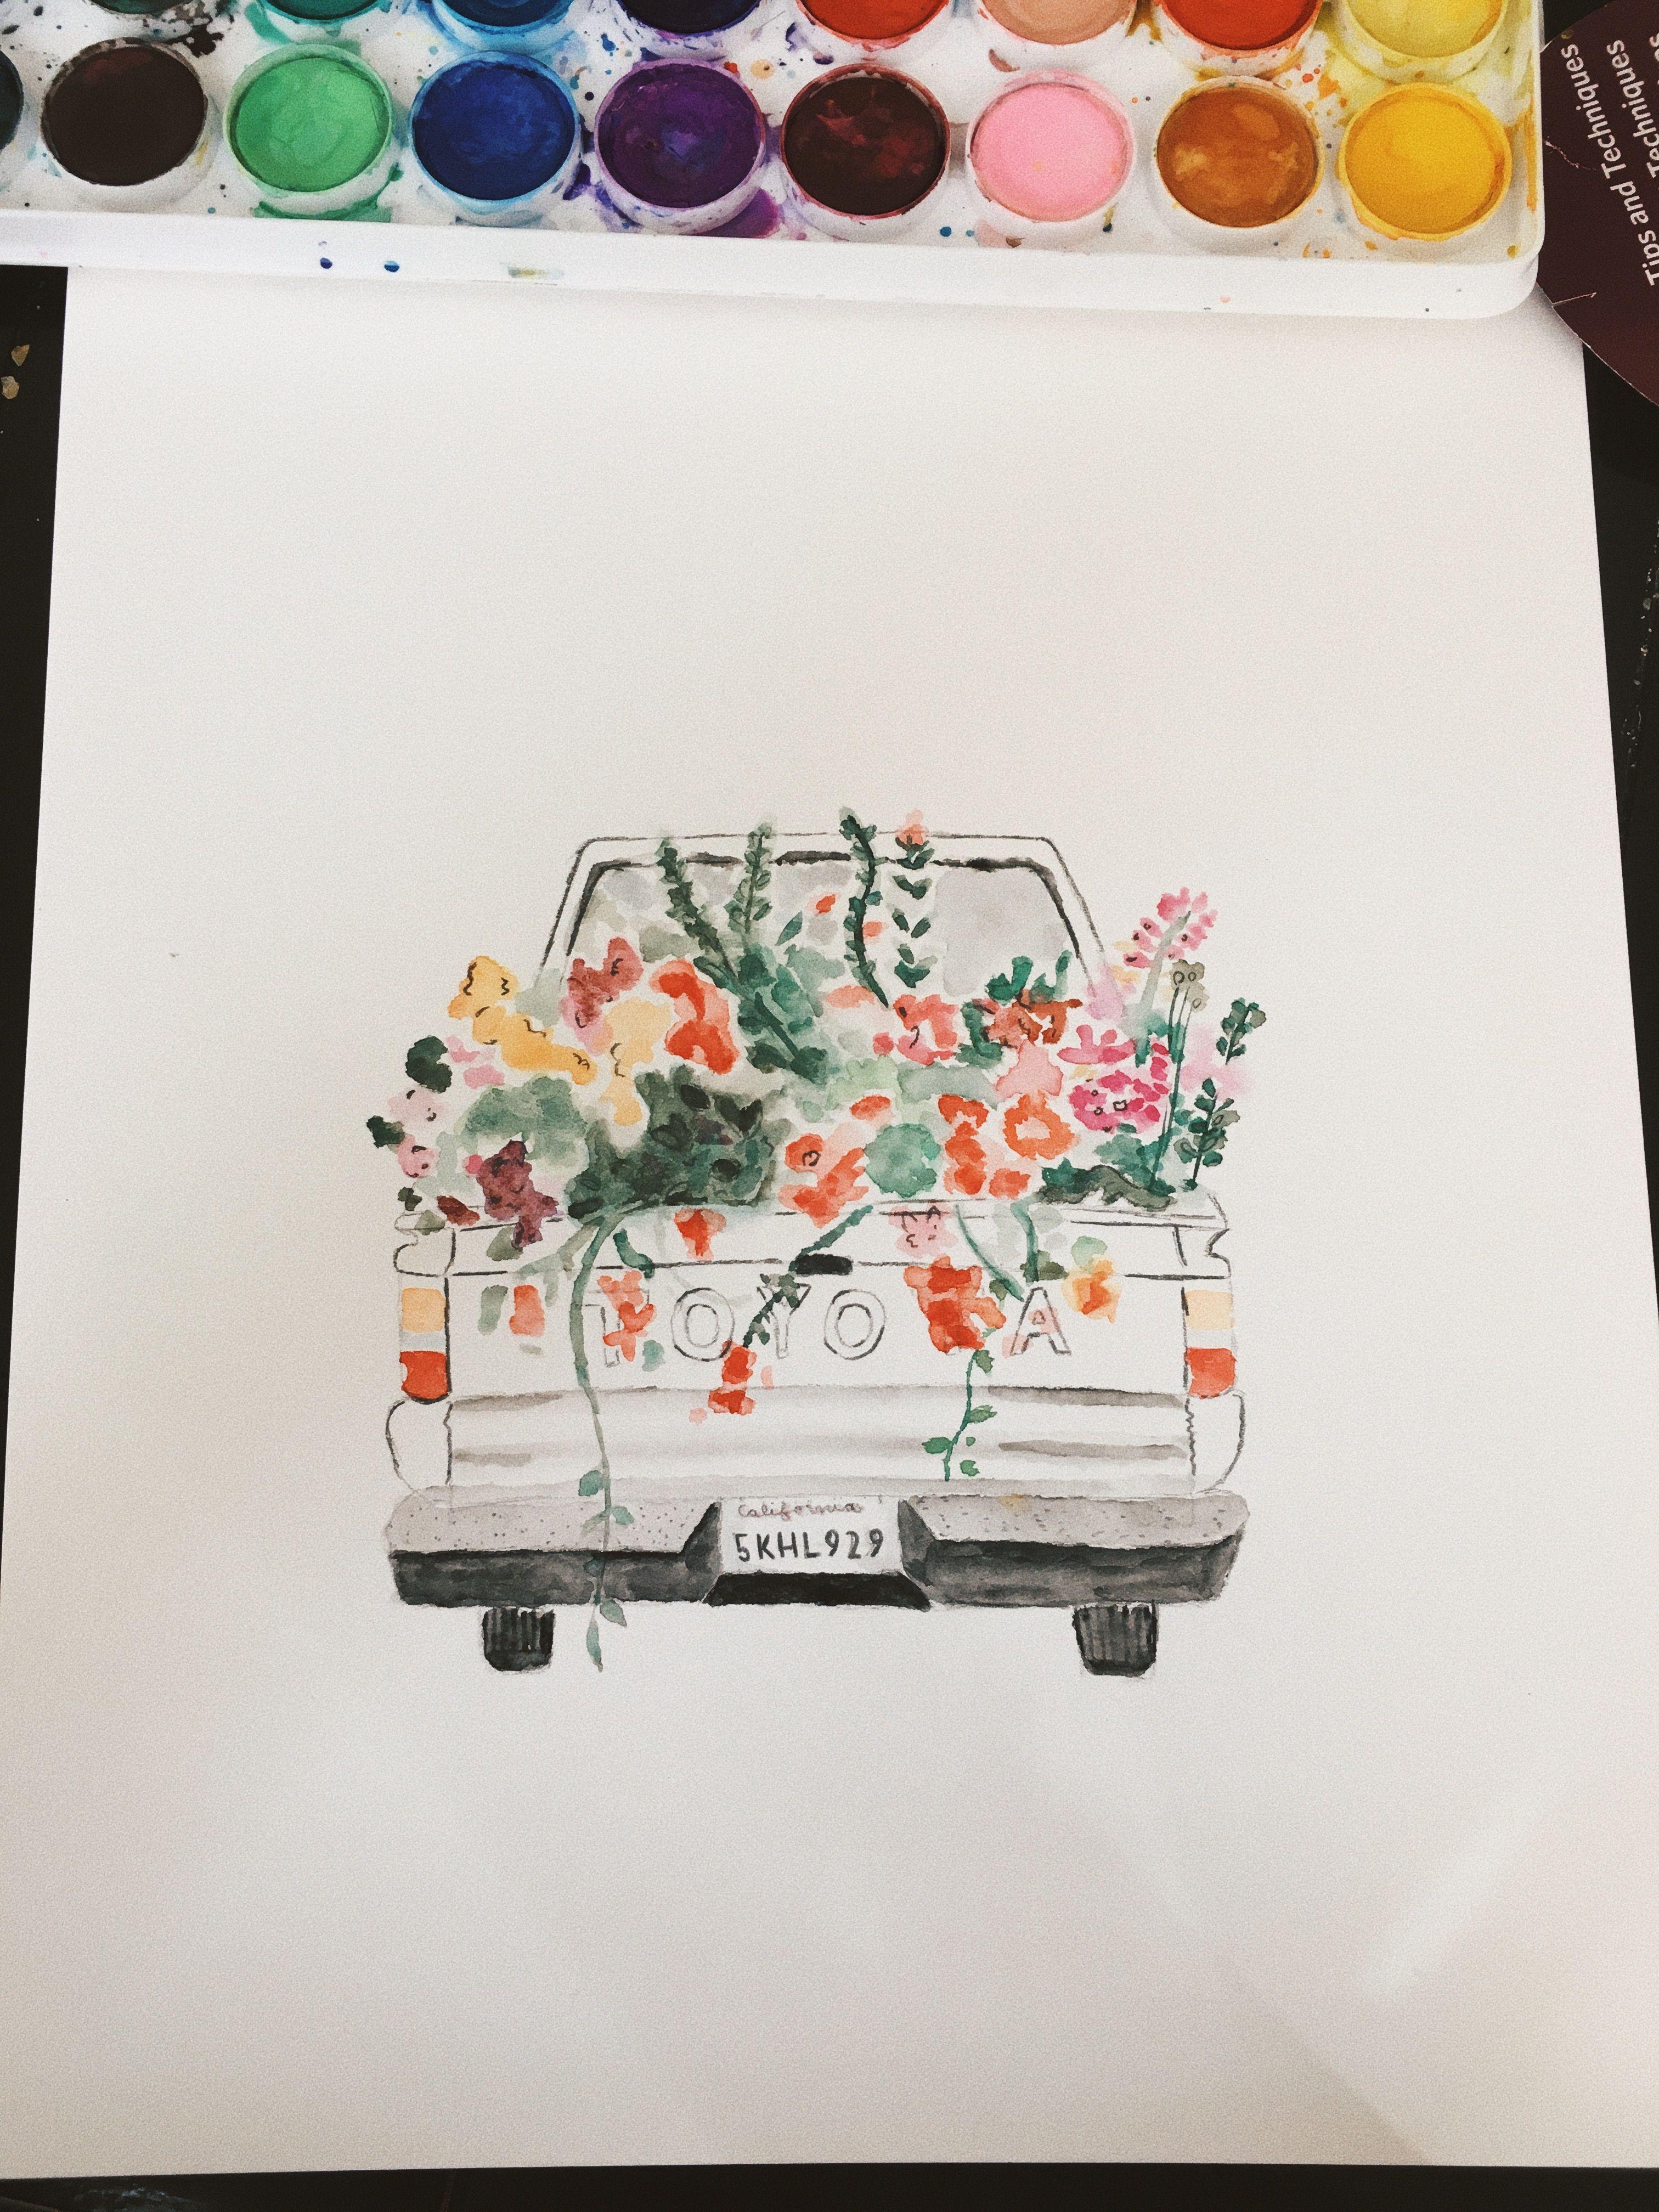 𝐏𝐢𝐧𝐭𝐞𝐫𝐞𝐬𝐭 𝐌𝐨𝐫𝐠𝐚𝐧𝐦𝐨𝐬𝐞𝐫𝐫𝐫 Art Painting